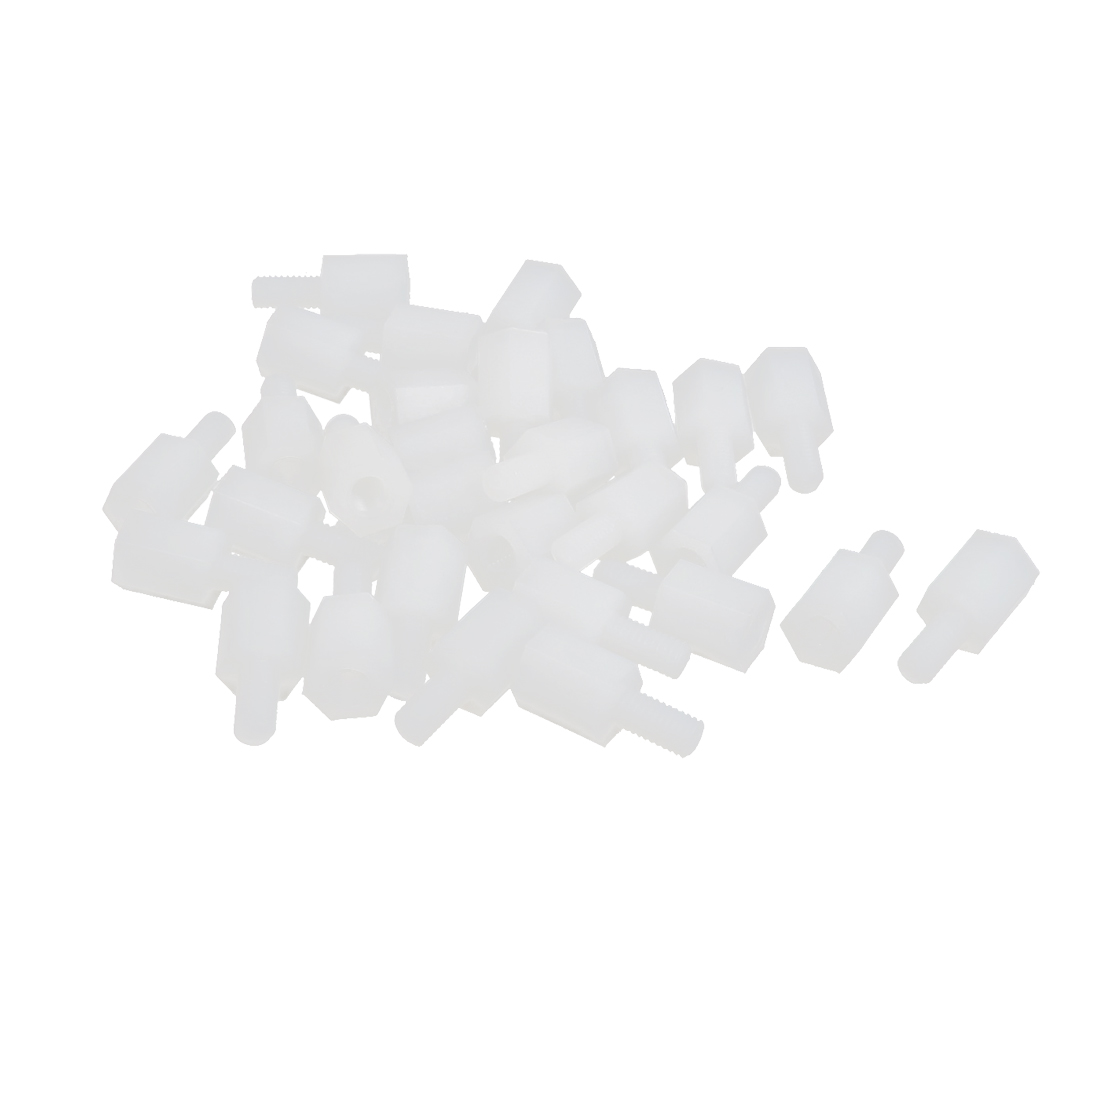 30pcs M3 7+6mm Male Female Thread Beige Nylon Hex Hexagonal Nut Standoff Screw Spacer Support